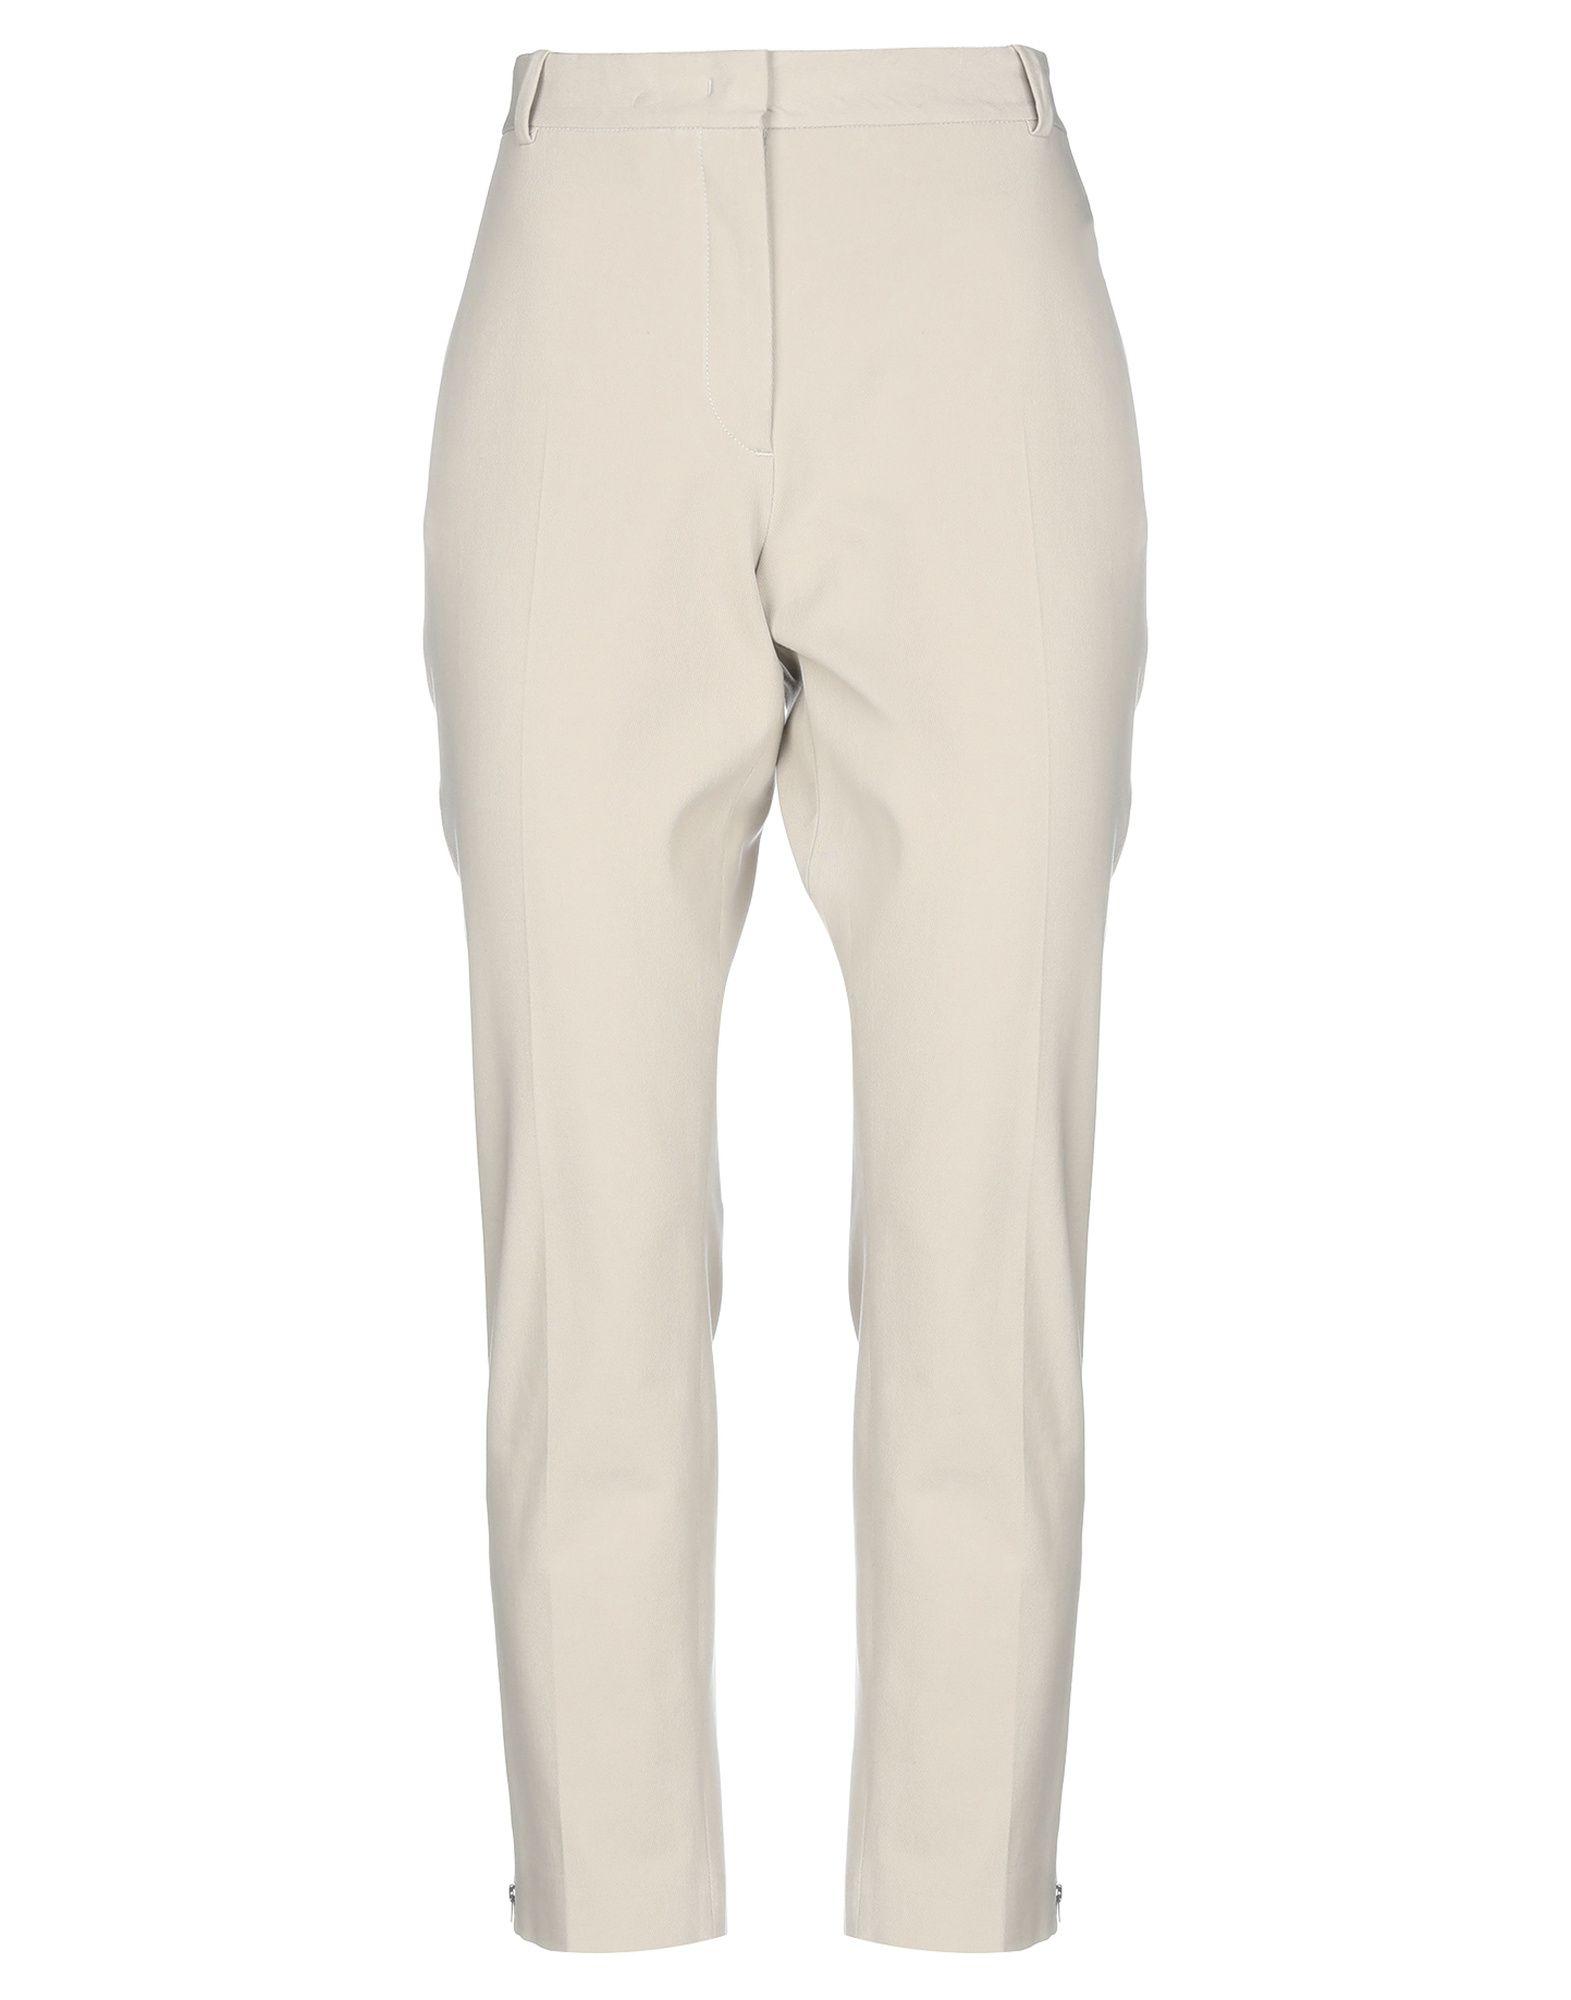 Pantalone Joseph donna donna donna - 13334457KJ f36